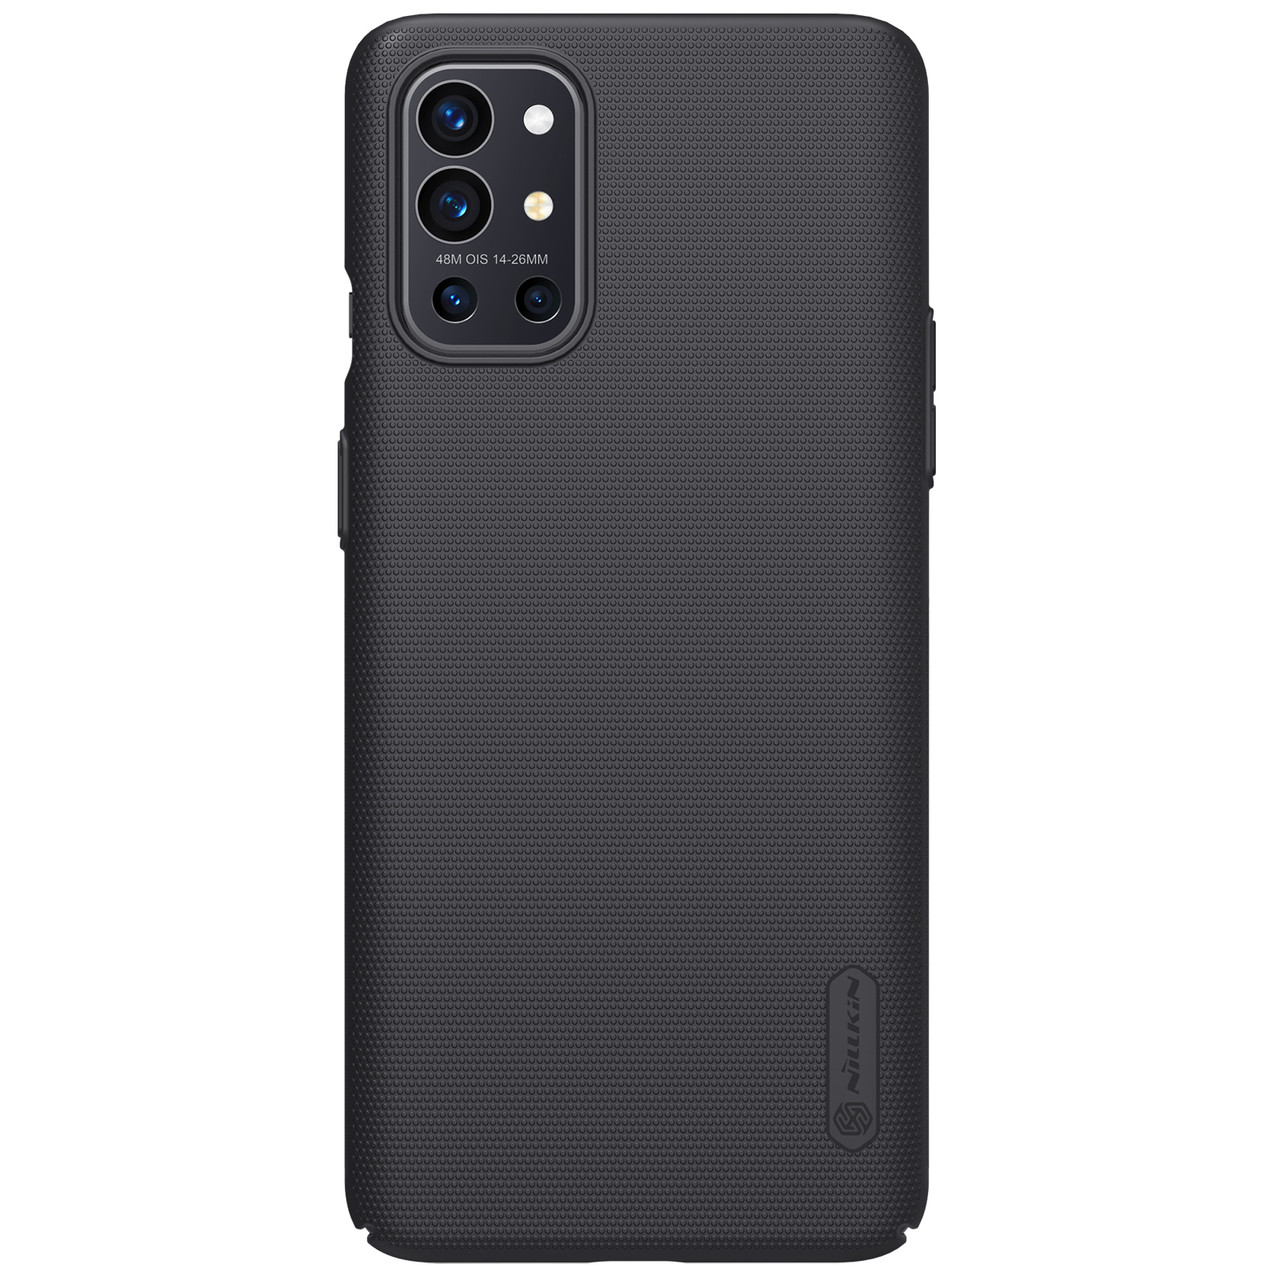 Защитный чехол Nillkin для OnePlus 9R Super Frosted Shield Black Черный